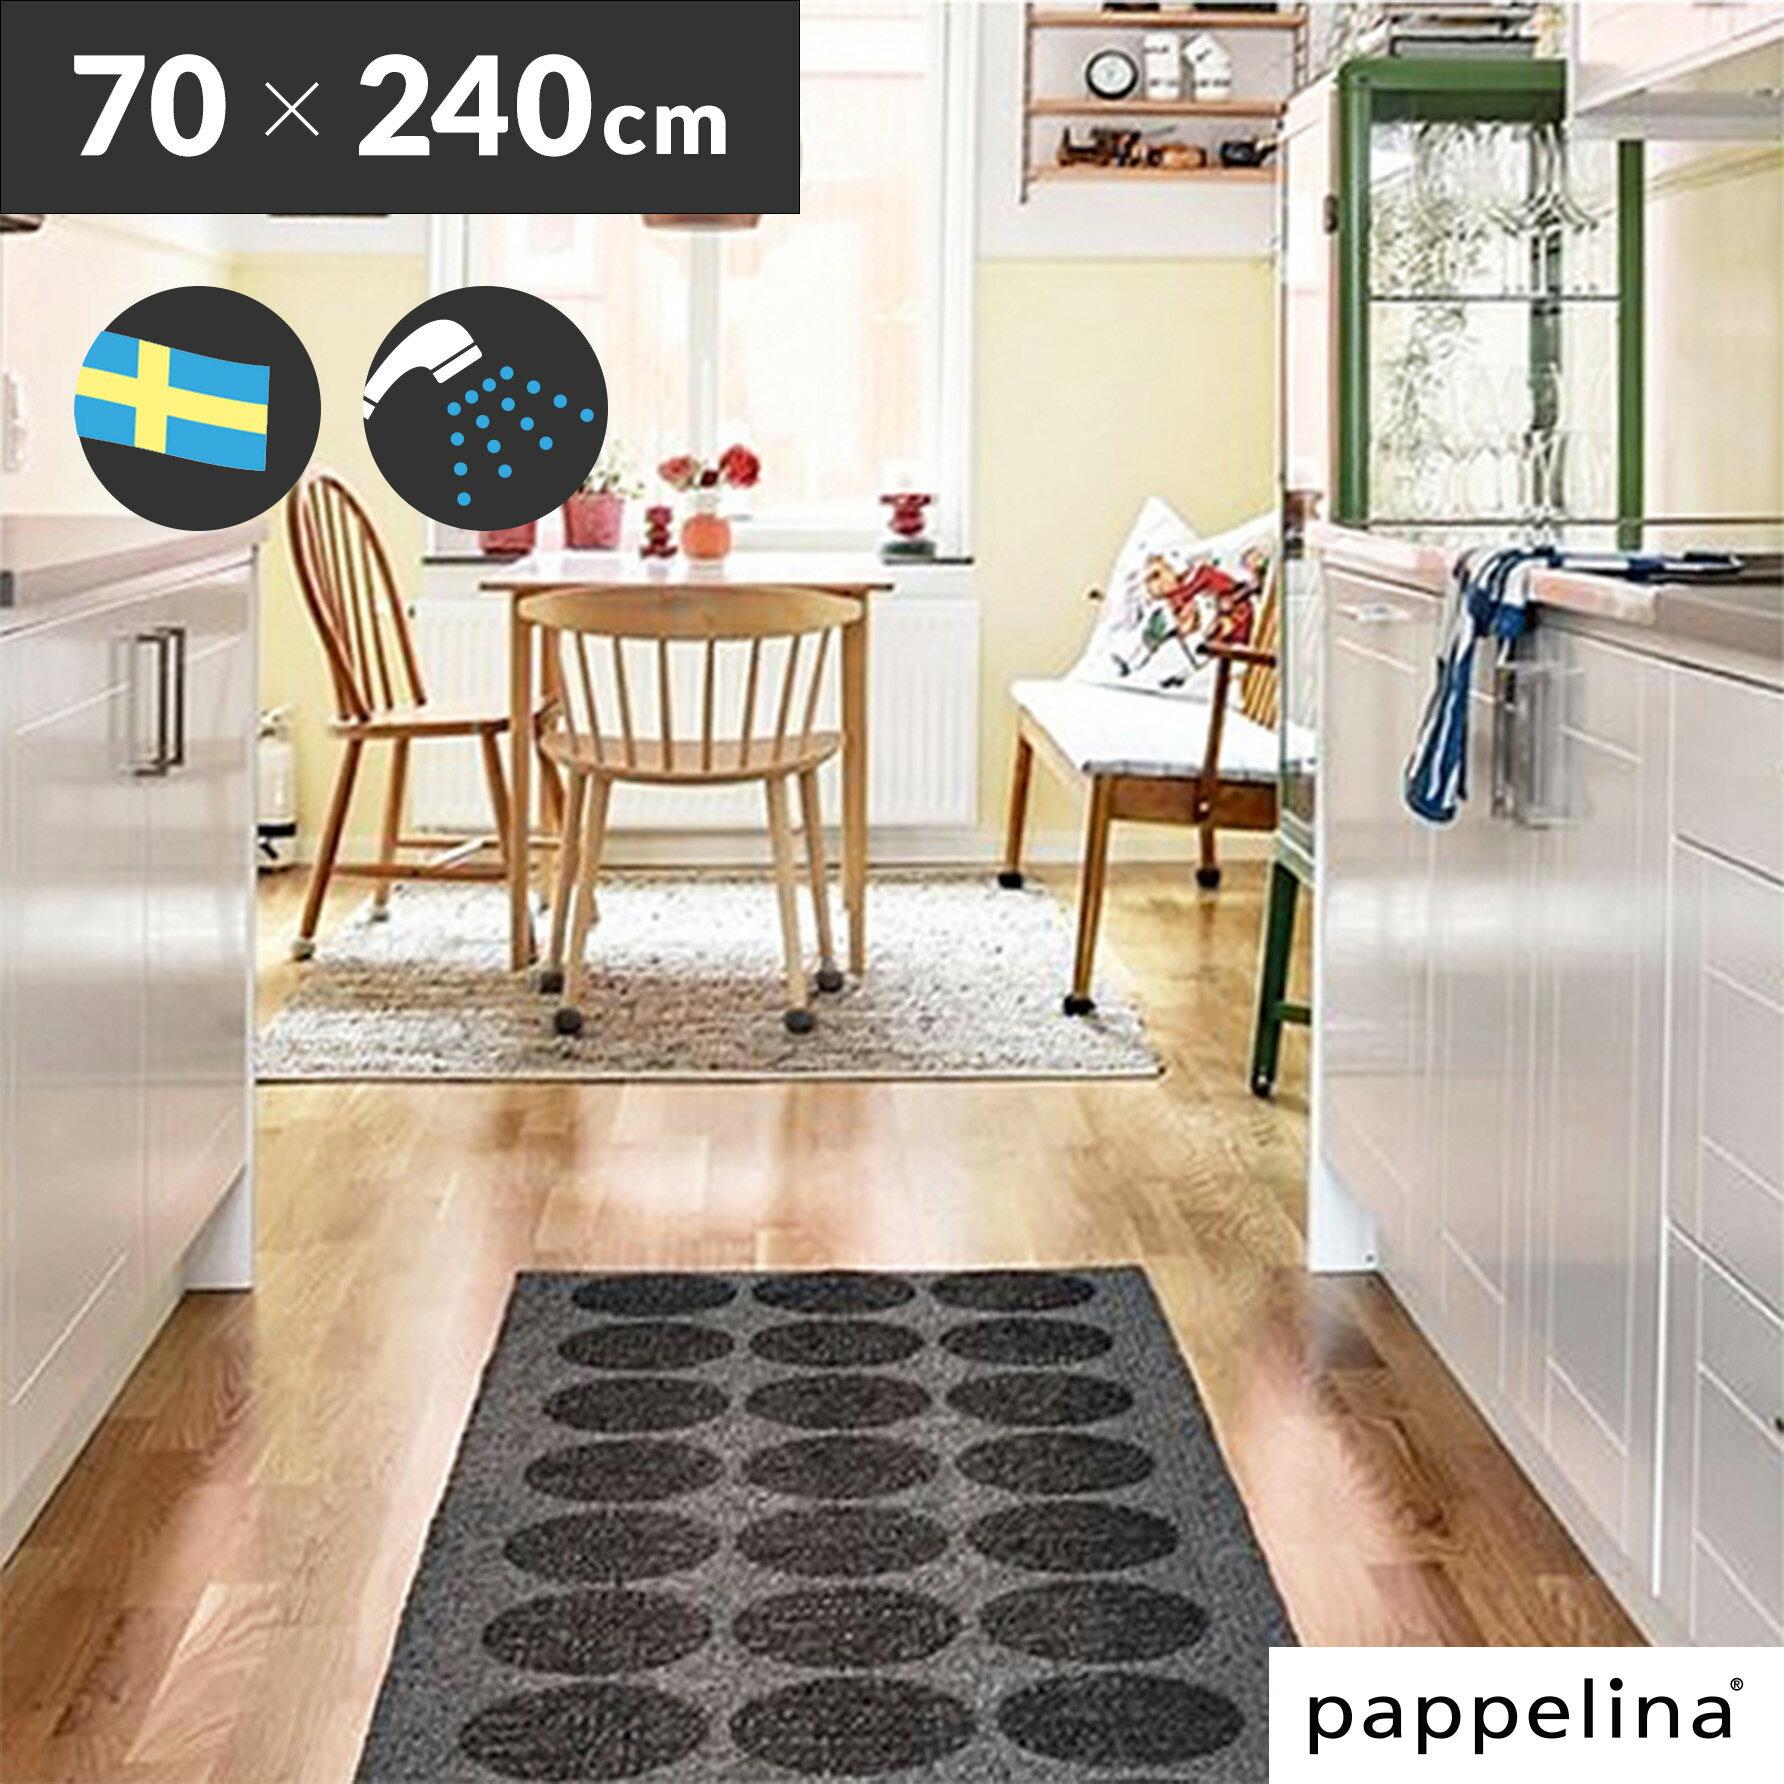 pappelina パペリナpappelina社 正規販売店Hugo Knitted Rugヒューゴ ラグマット70-240(キッチンマット/玄関マット)